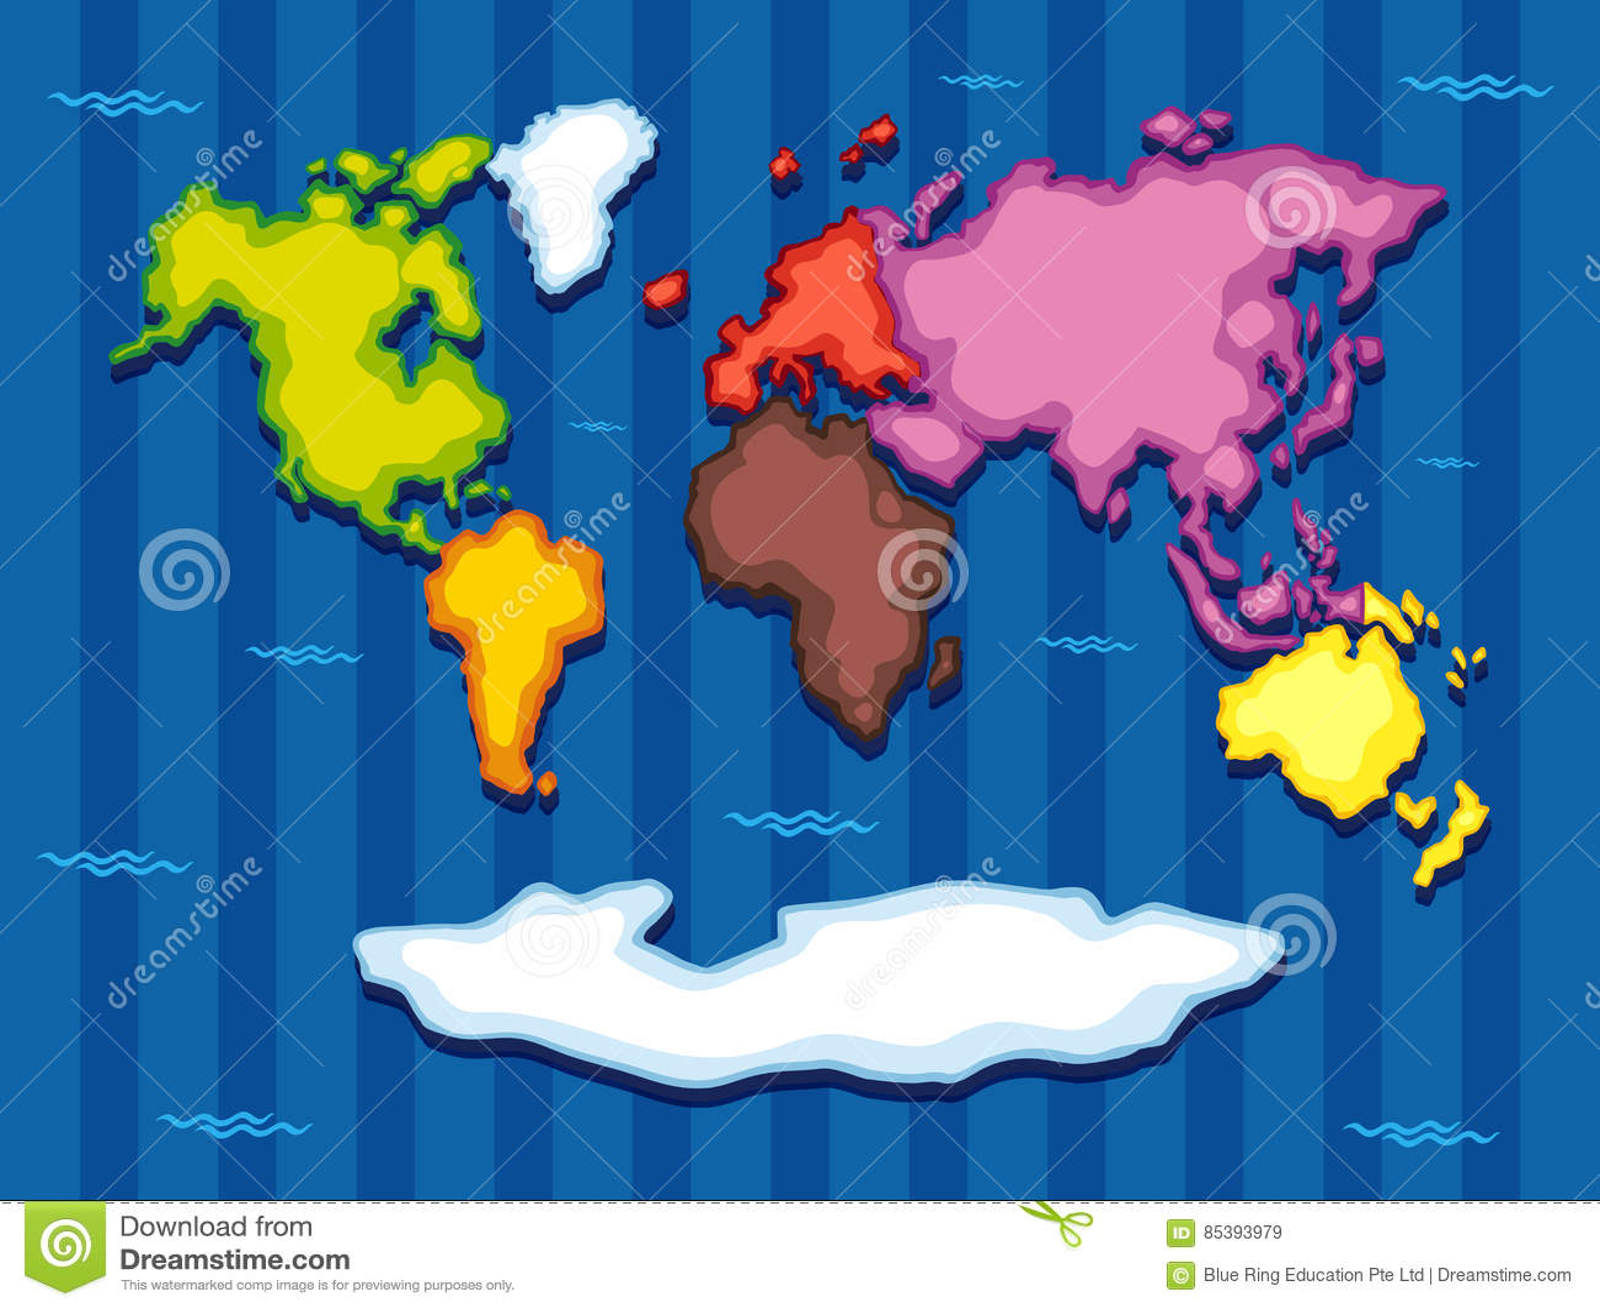 Seven Continents World Map Cartoon Vector